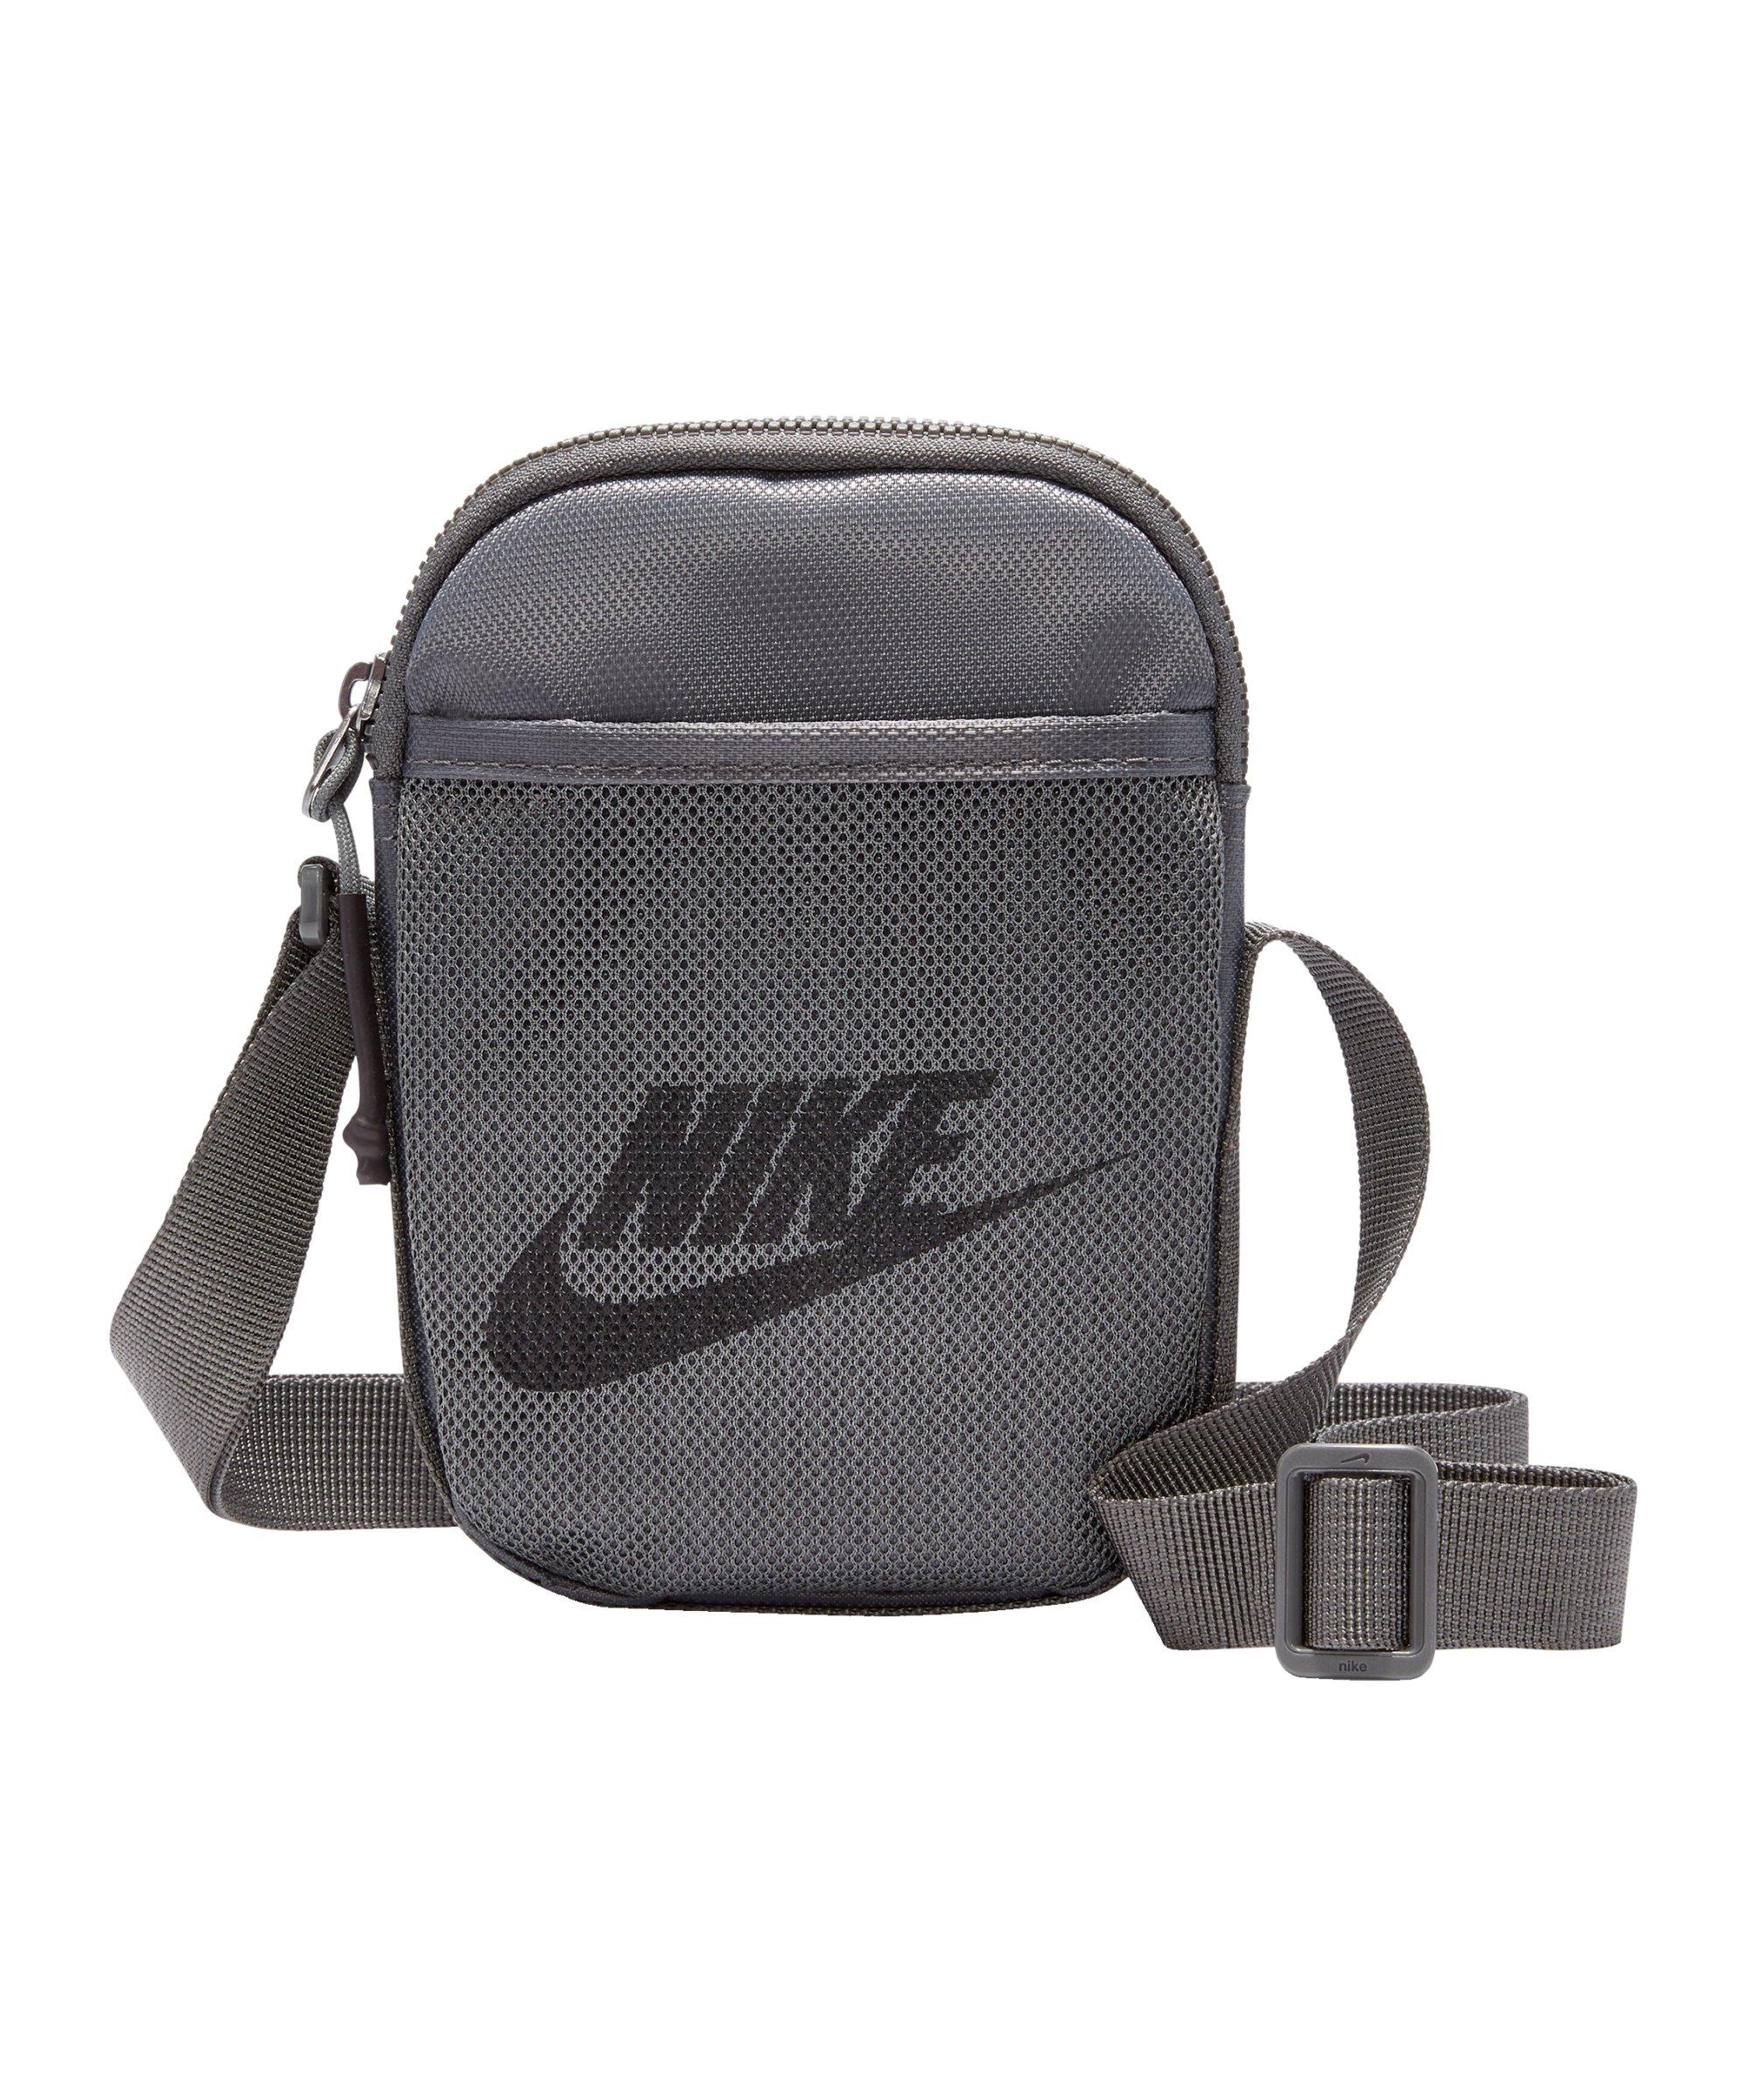 Nike Heritage Items Bag Tasche Grau Schwarz F068 - grau